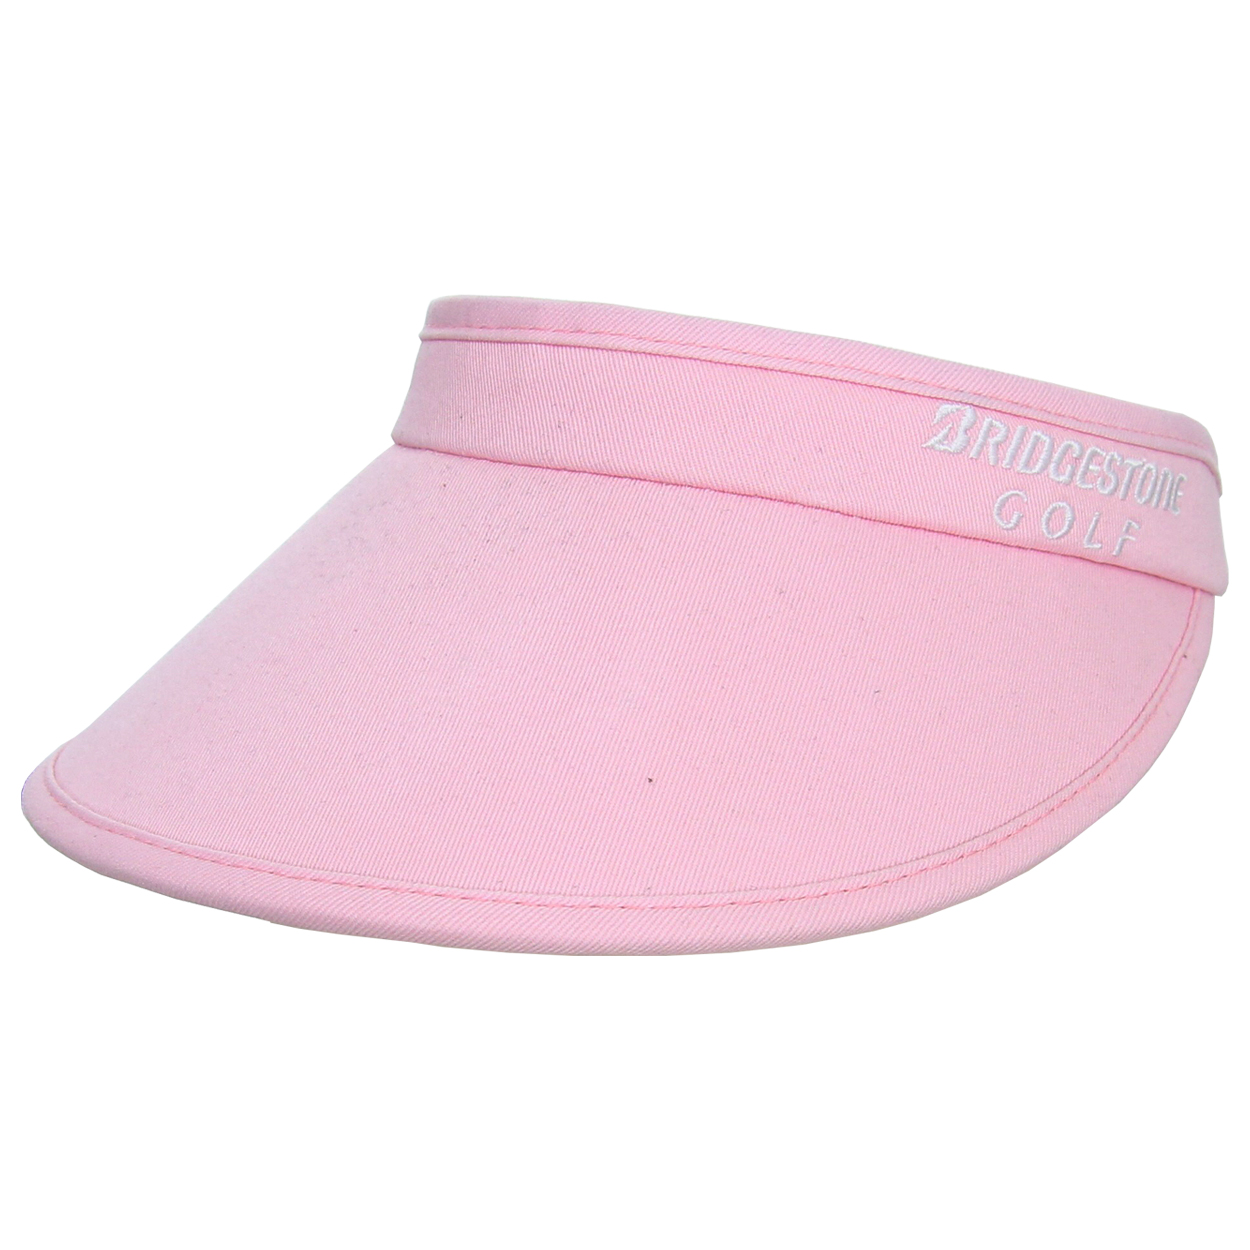 bridgestone s headband wide brim golf visor